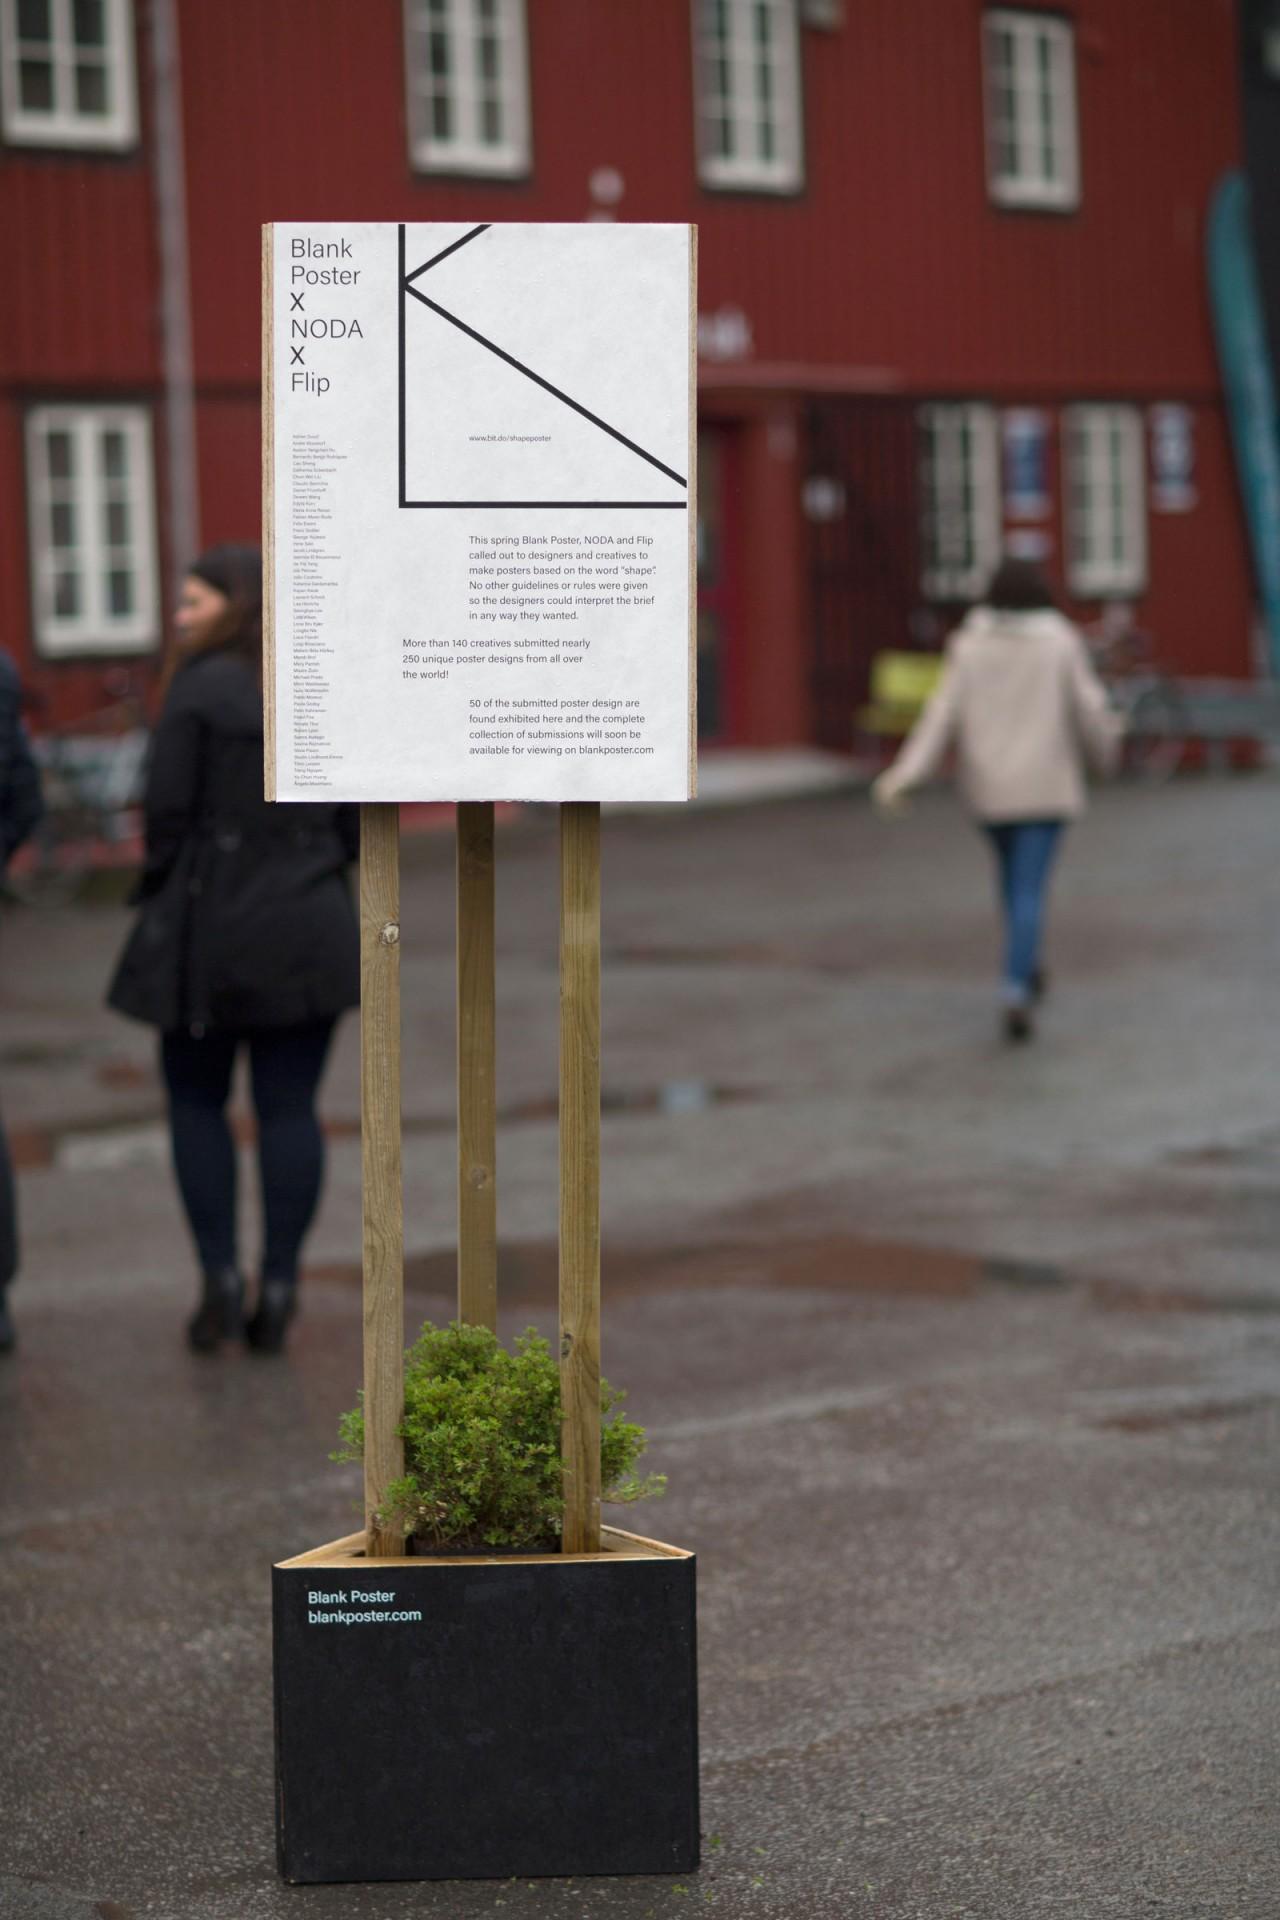 Anders Bakken Blank Poster x Noda x Flip